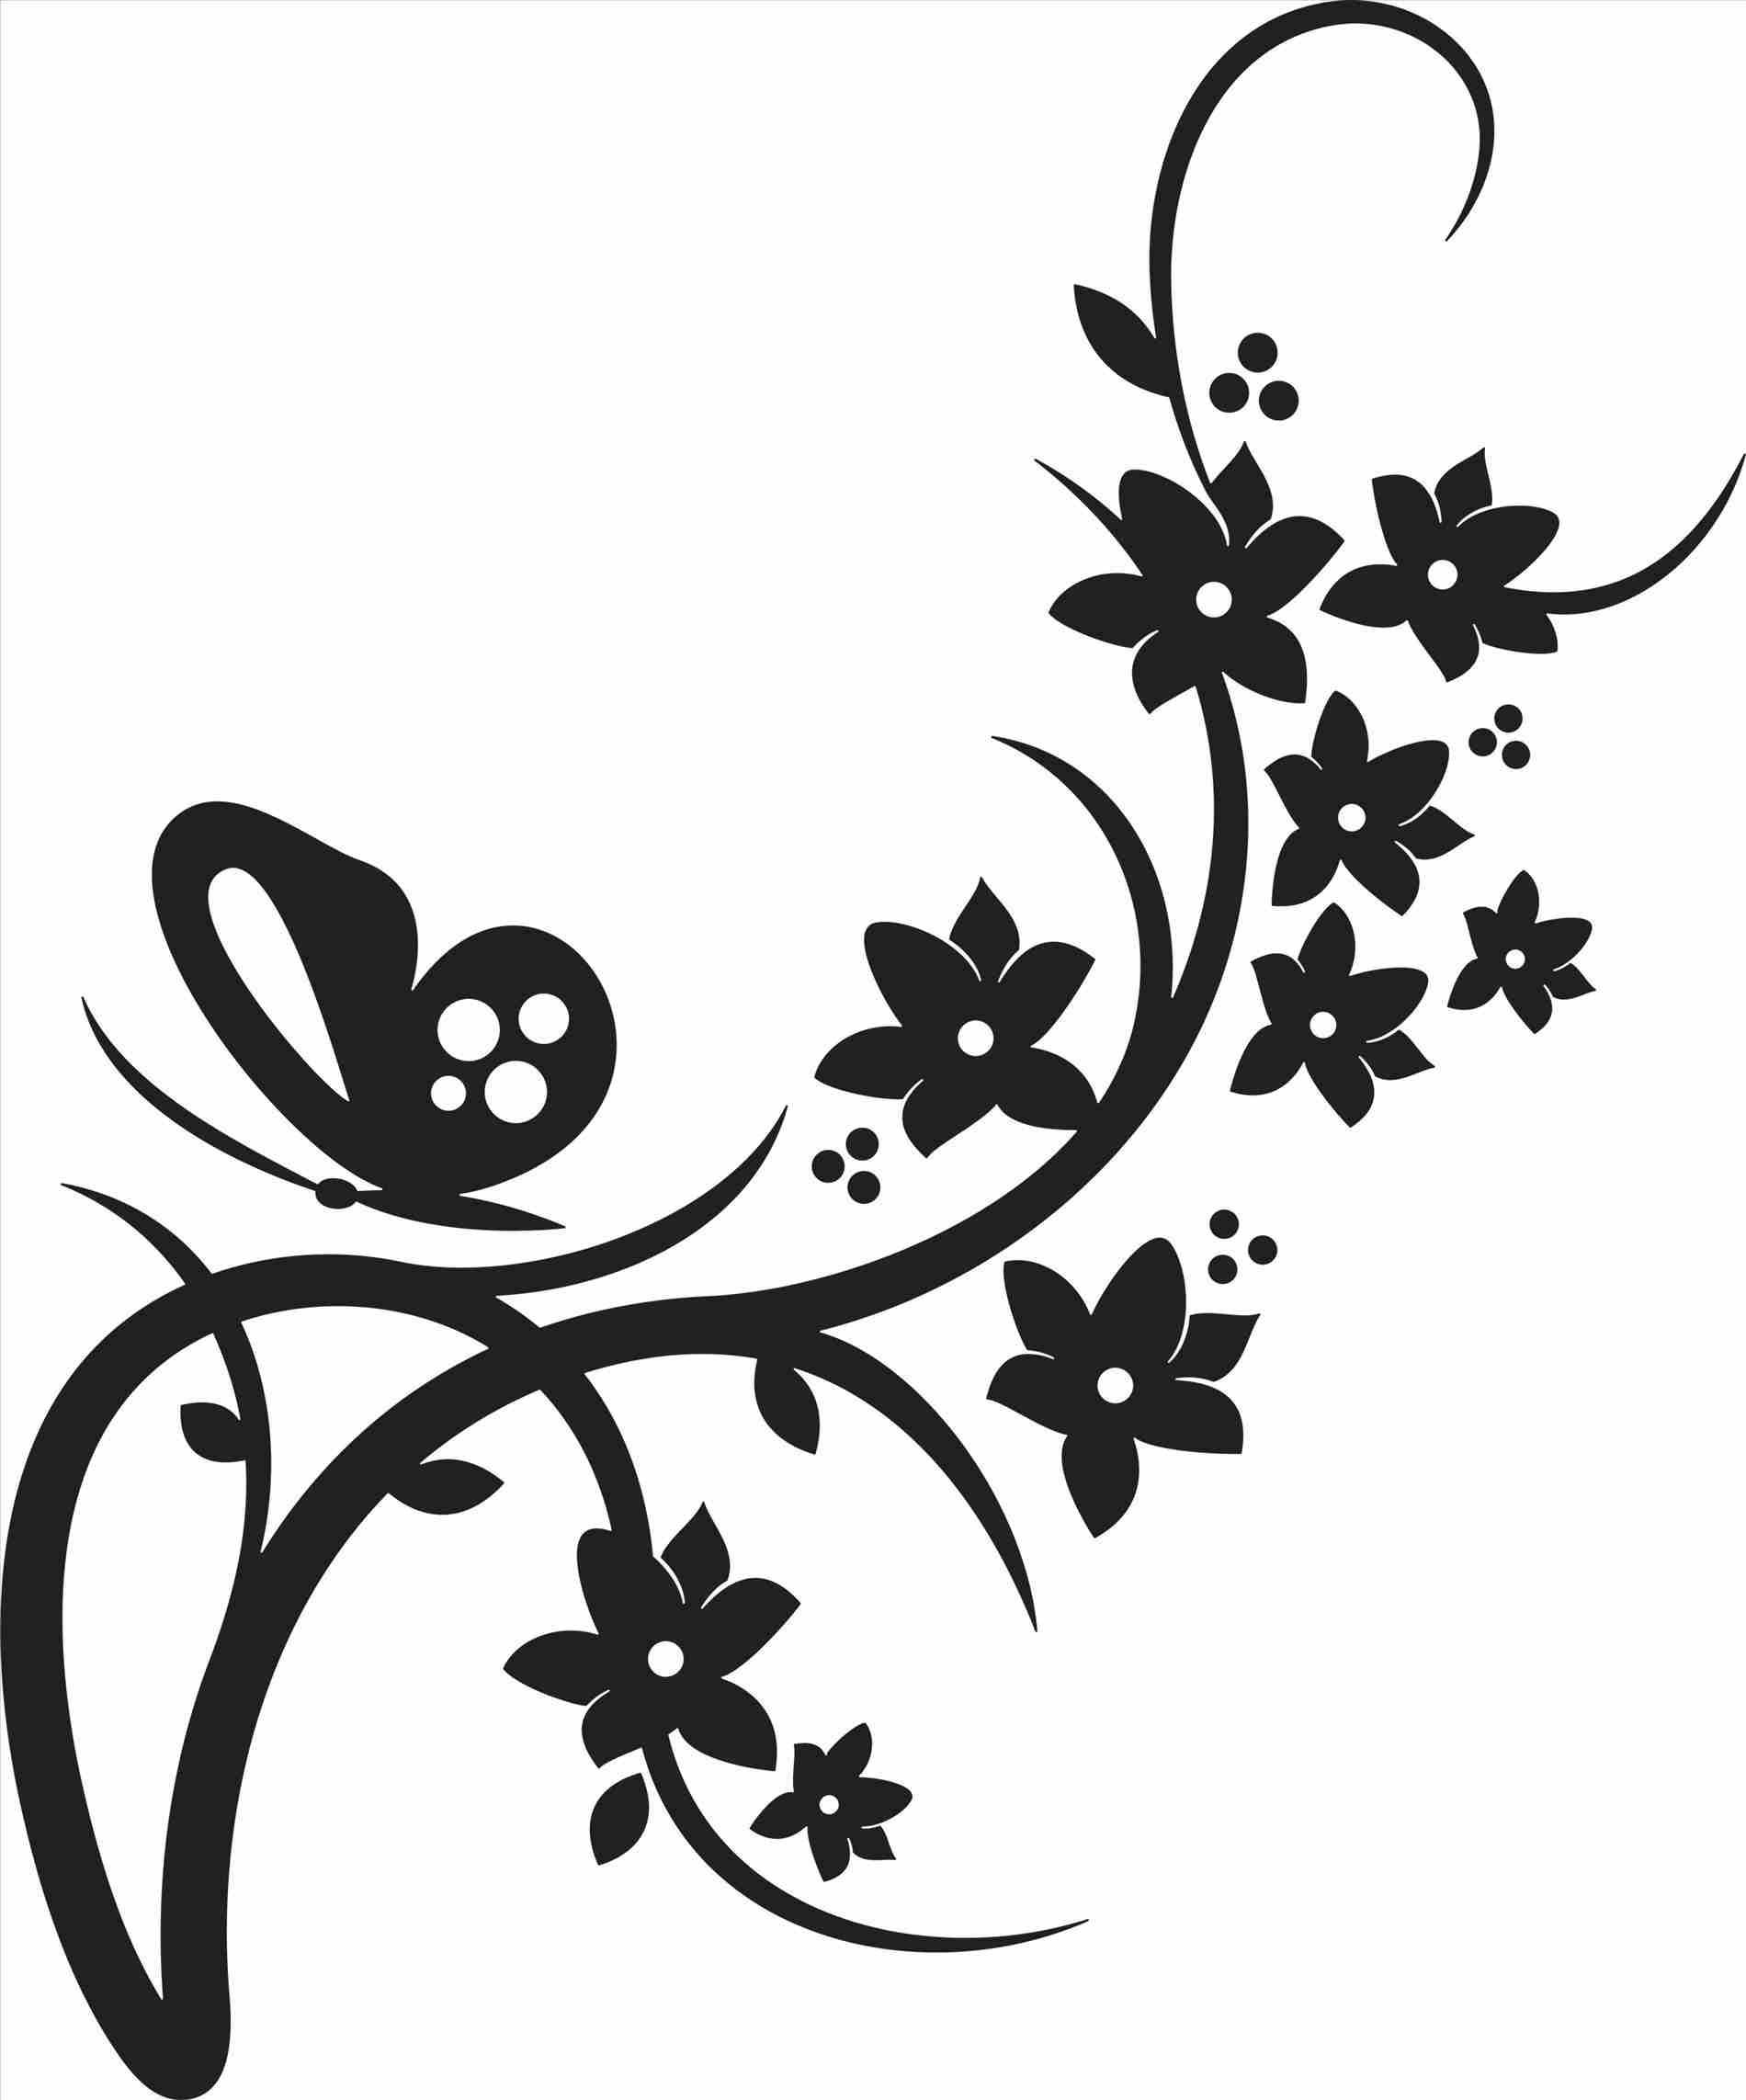 1900x2285 Religious Christmas Free Flower Border Clip Art Black And White